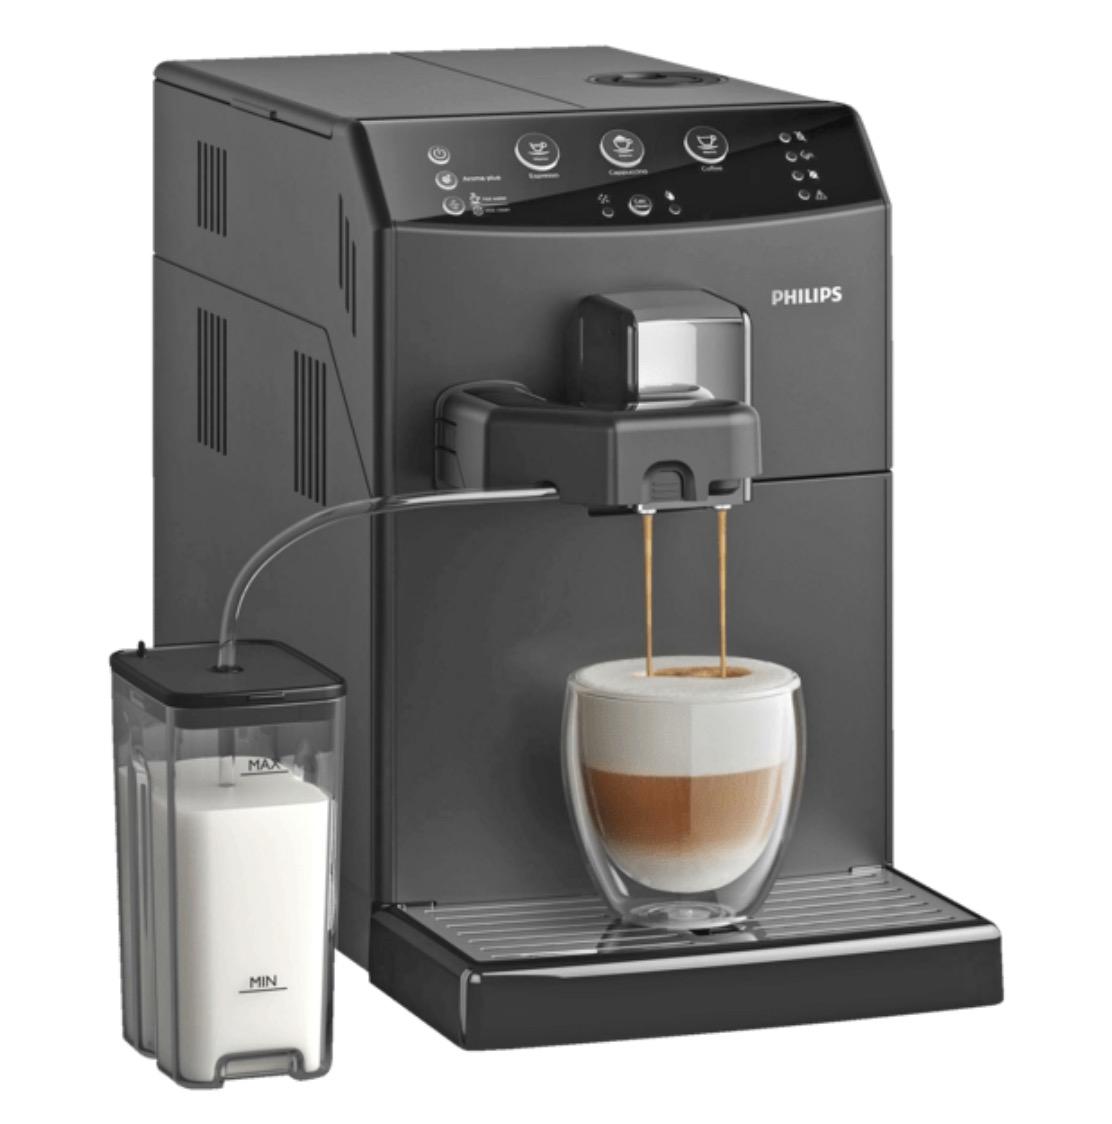 PHILIPS HD 8829/01 Kaffeevollautomat (1.8 Liter, 15 bar) nur 289,- Euro